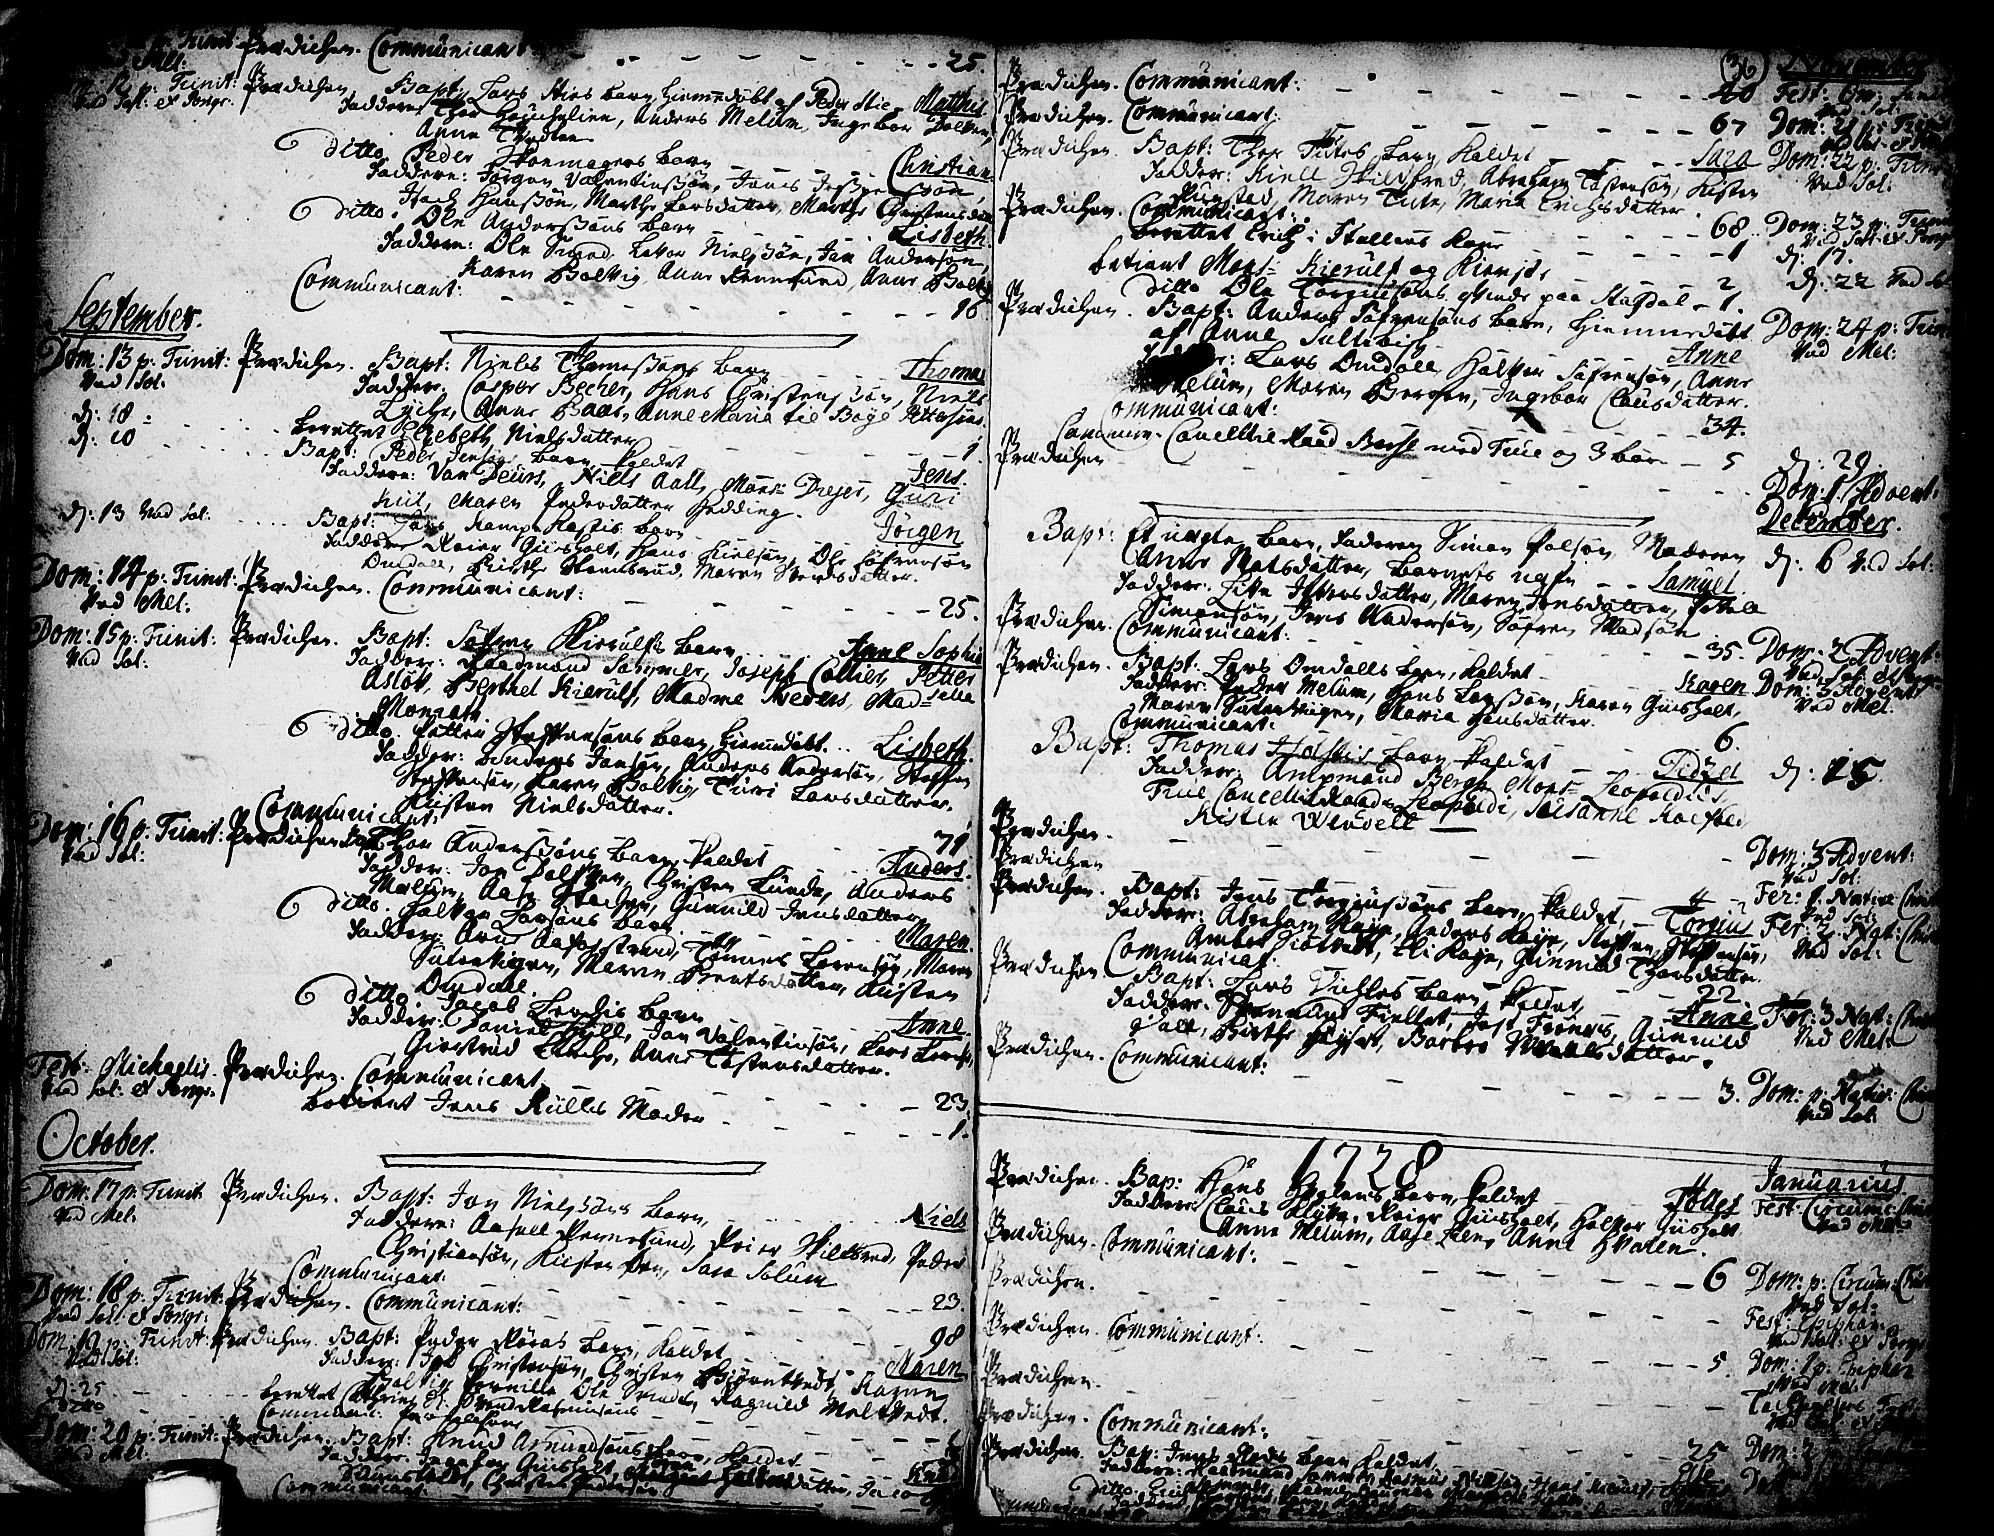 SAKO, Solum kirkebøker, F/Fa/L0002: Ministerialbok nr. I 2, 1713-1761, s. 36